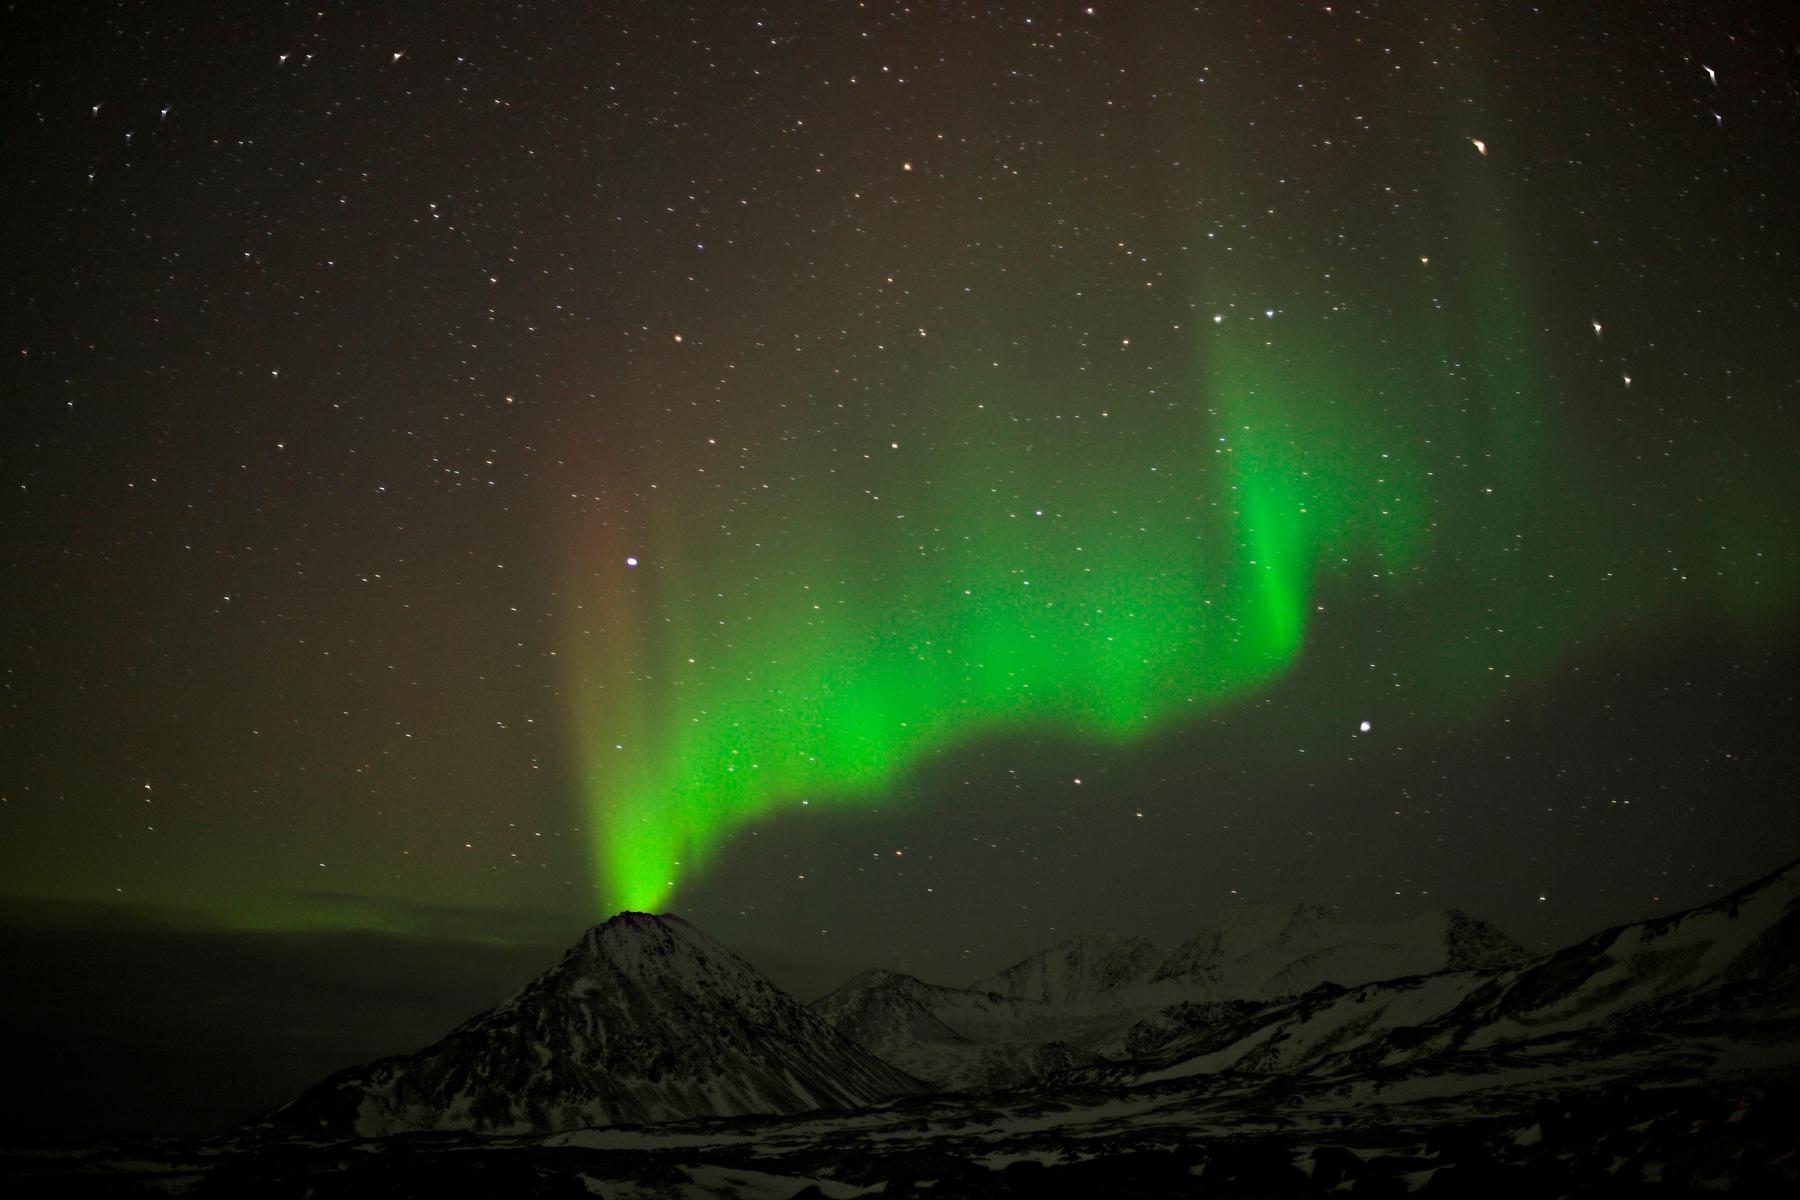 mejores lugares aurora boreal islandia, como ver aurora boreal islandia, viajar a islandia, cuanto cuesta ver aurora boreal, donde ver aurora boreal, stokksness